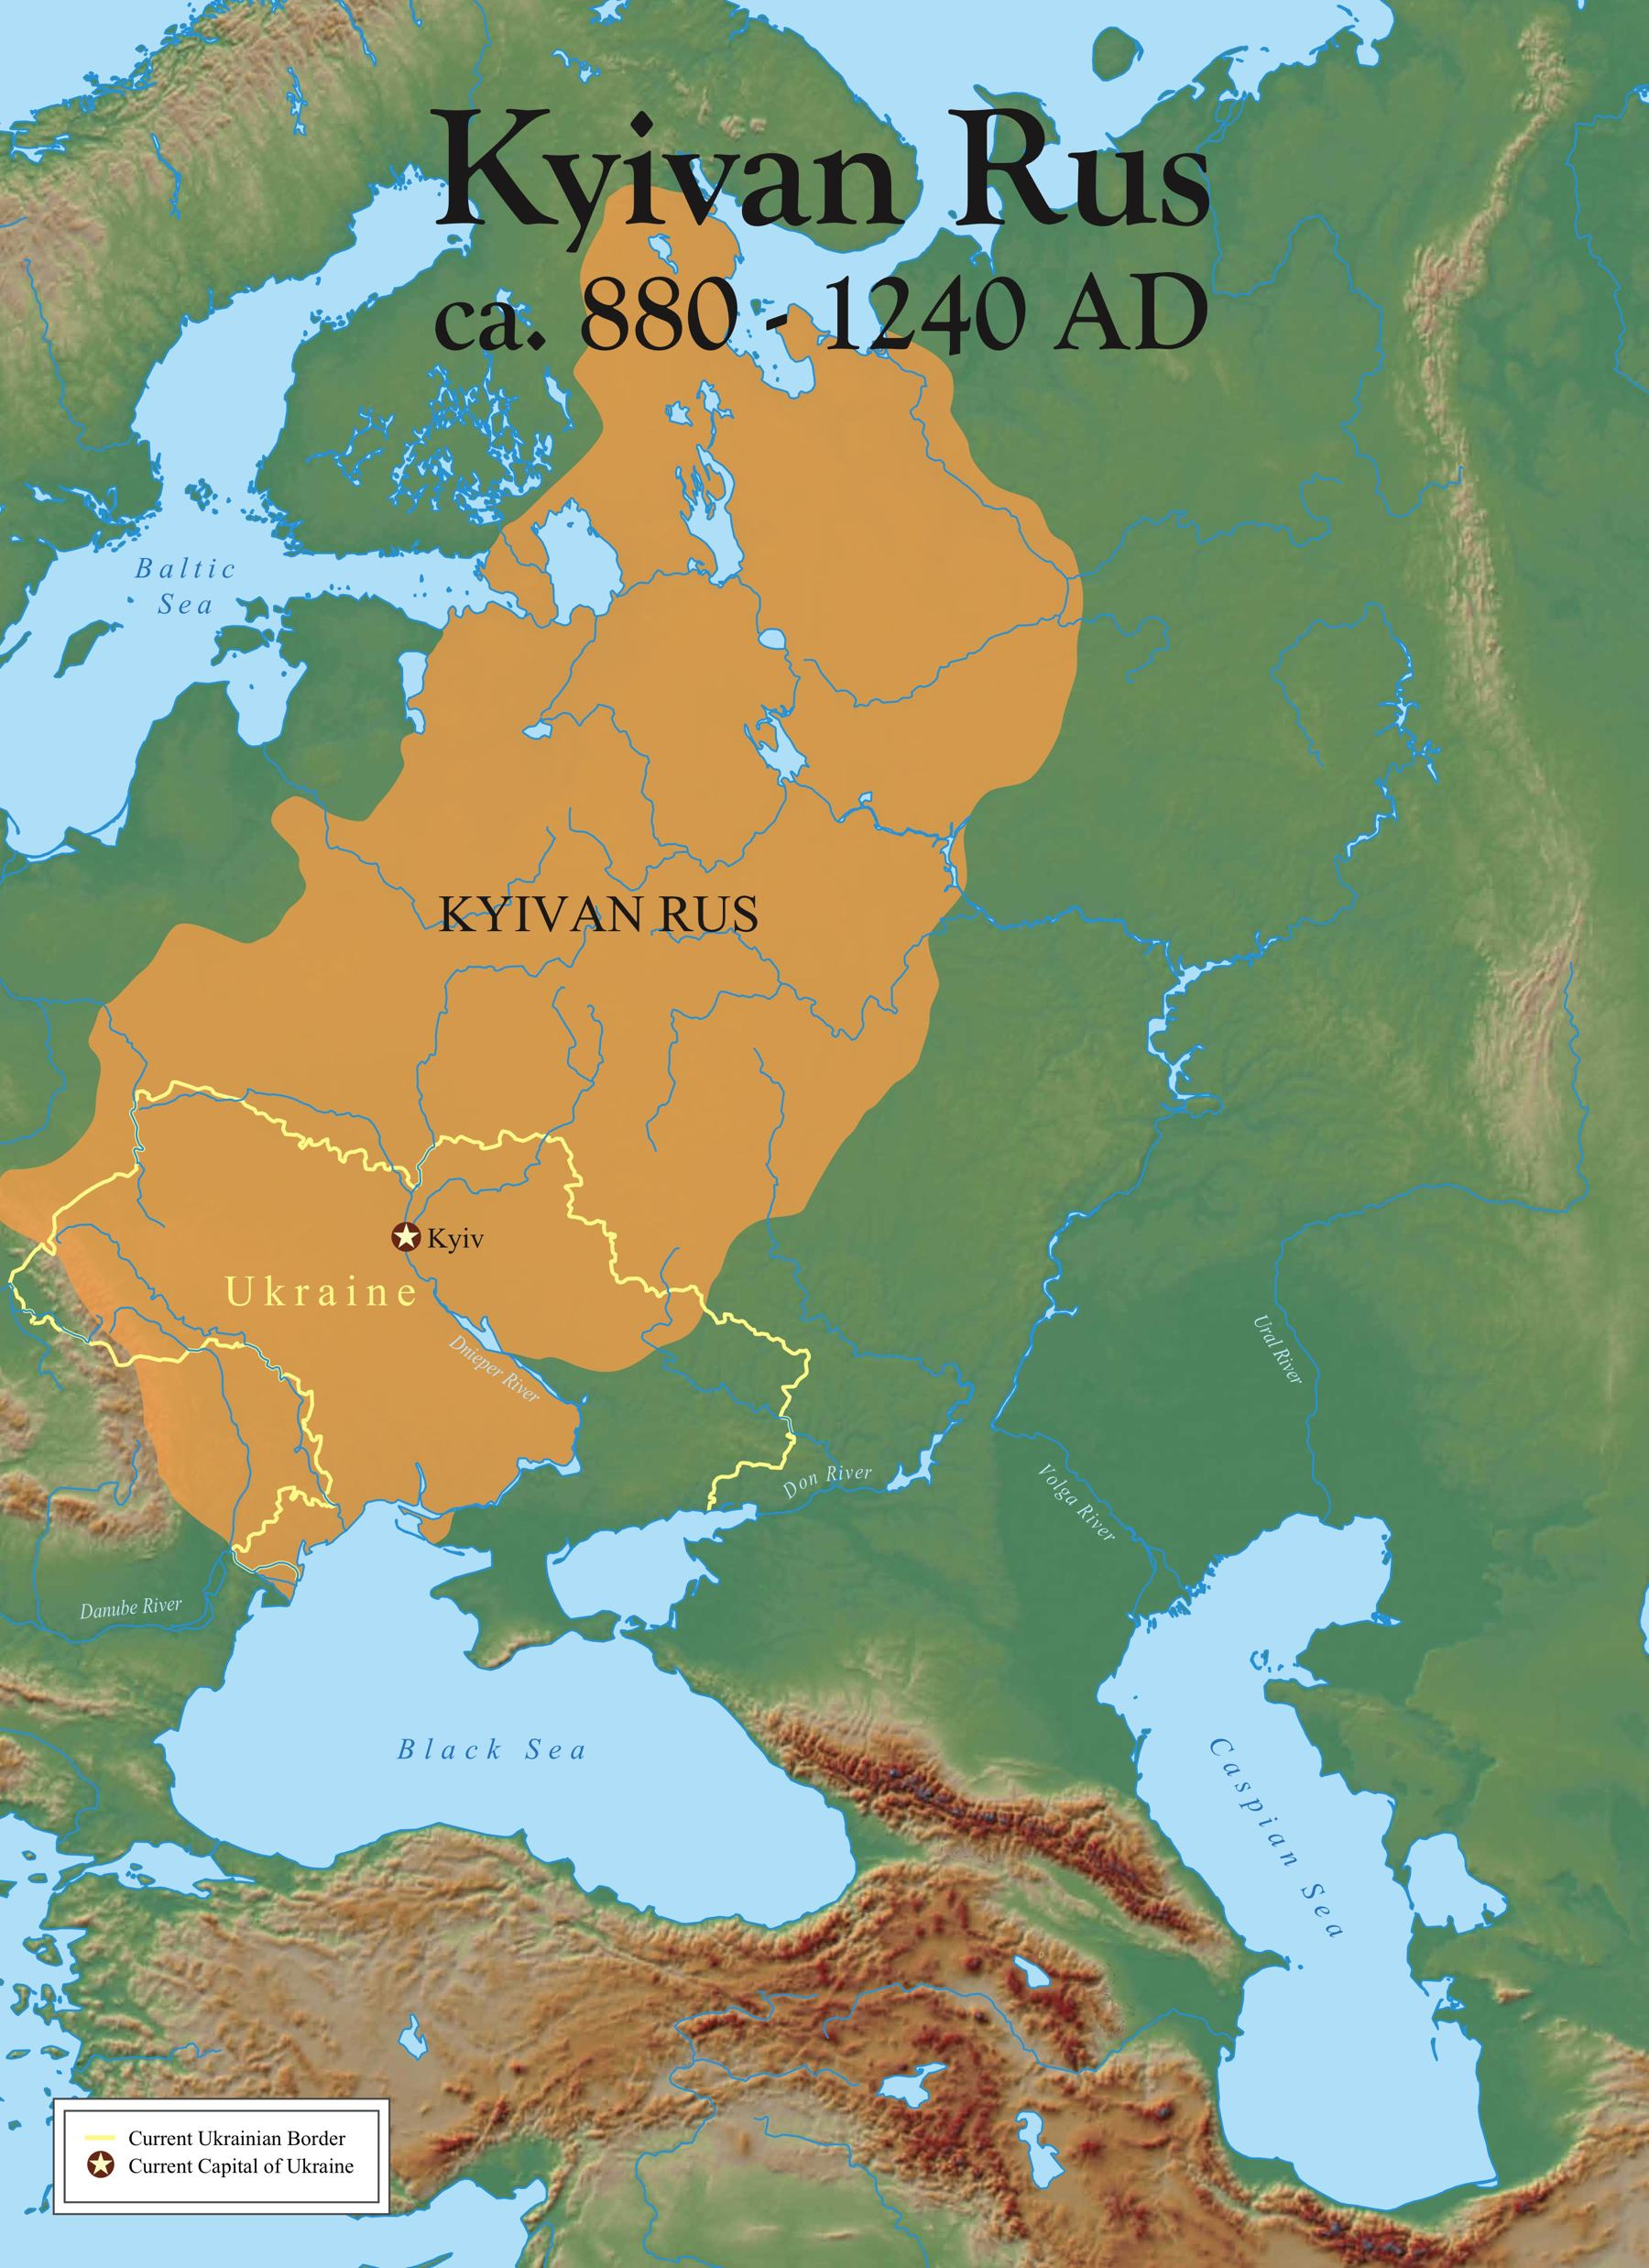 Image KyivianRusMapsmalljpg Odins Ulve Wiki FANDOM - R us map